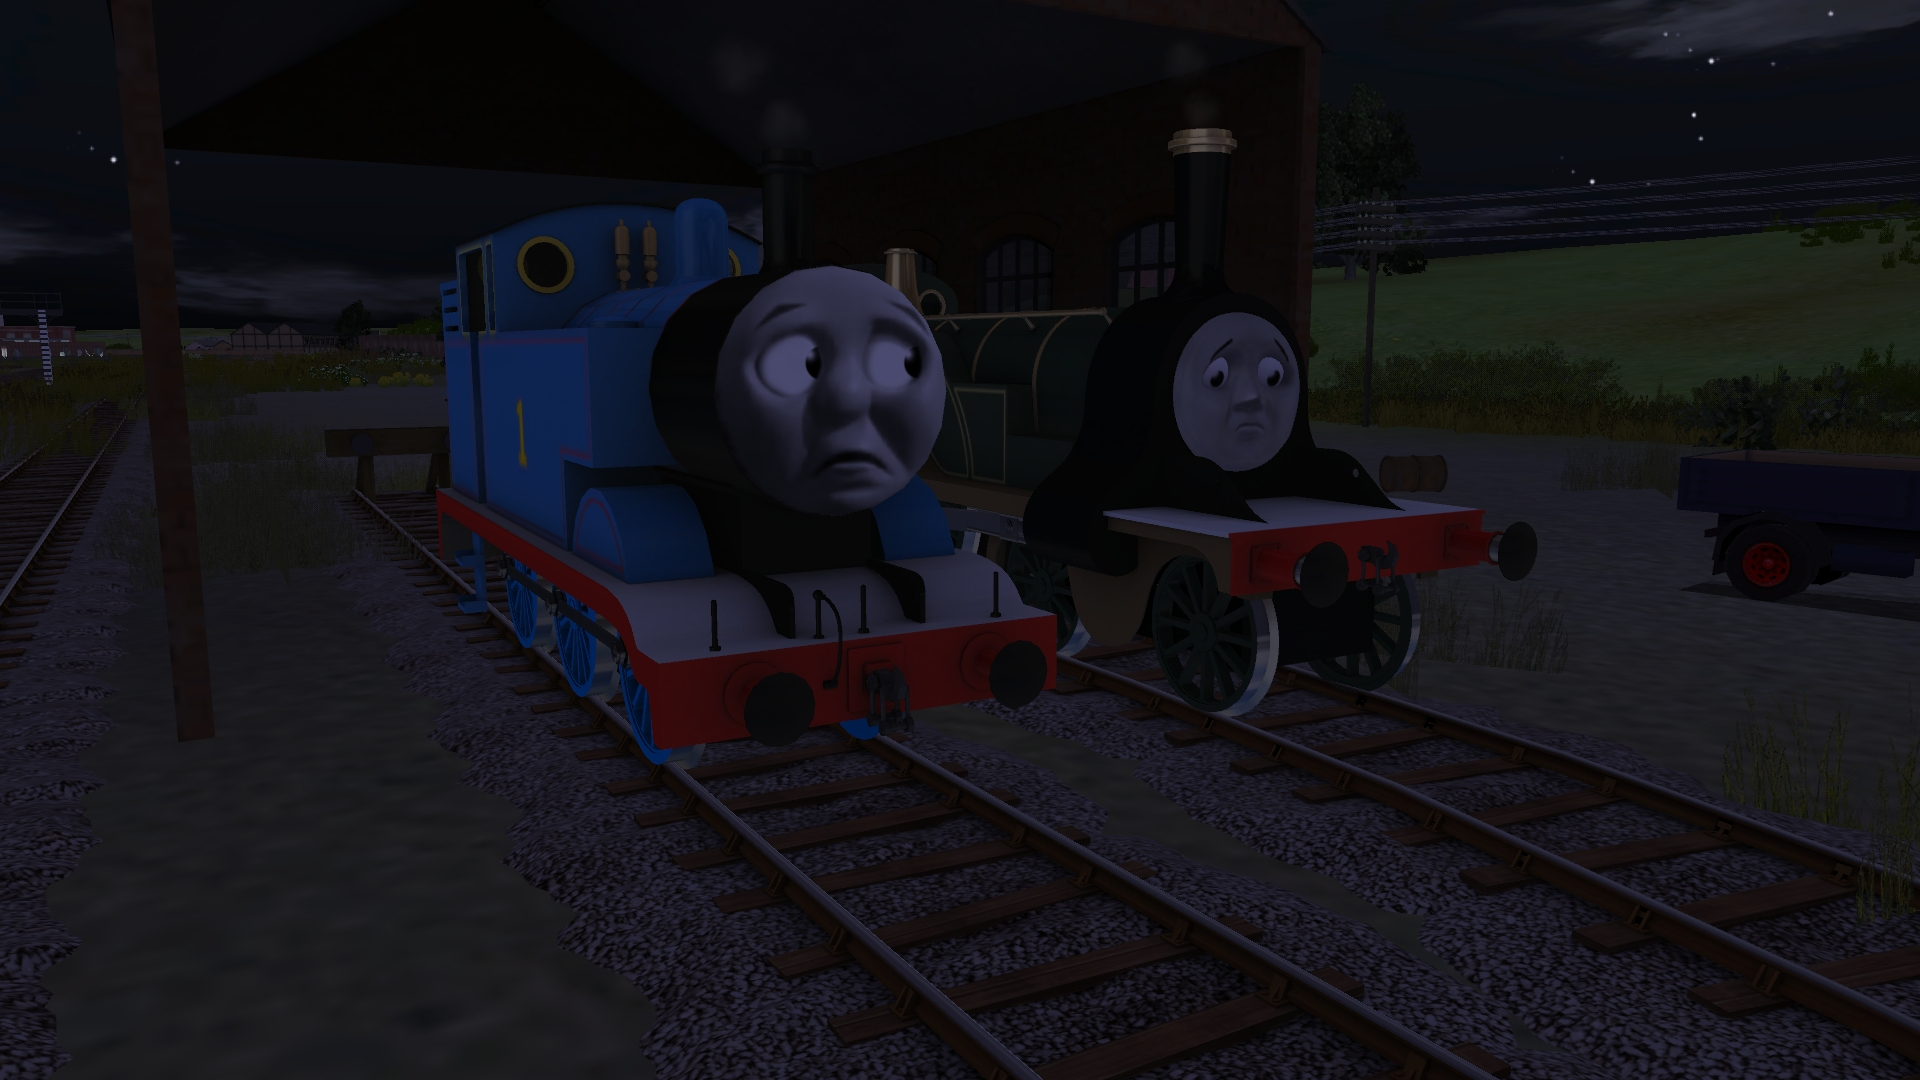 James Duncan - Night Tracks